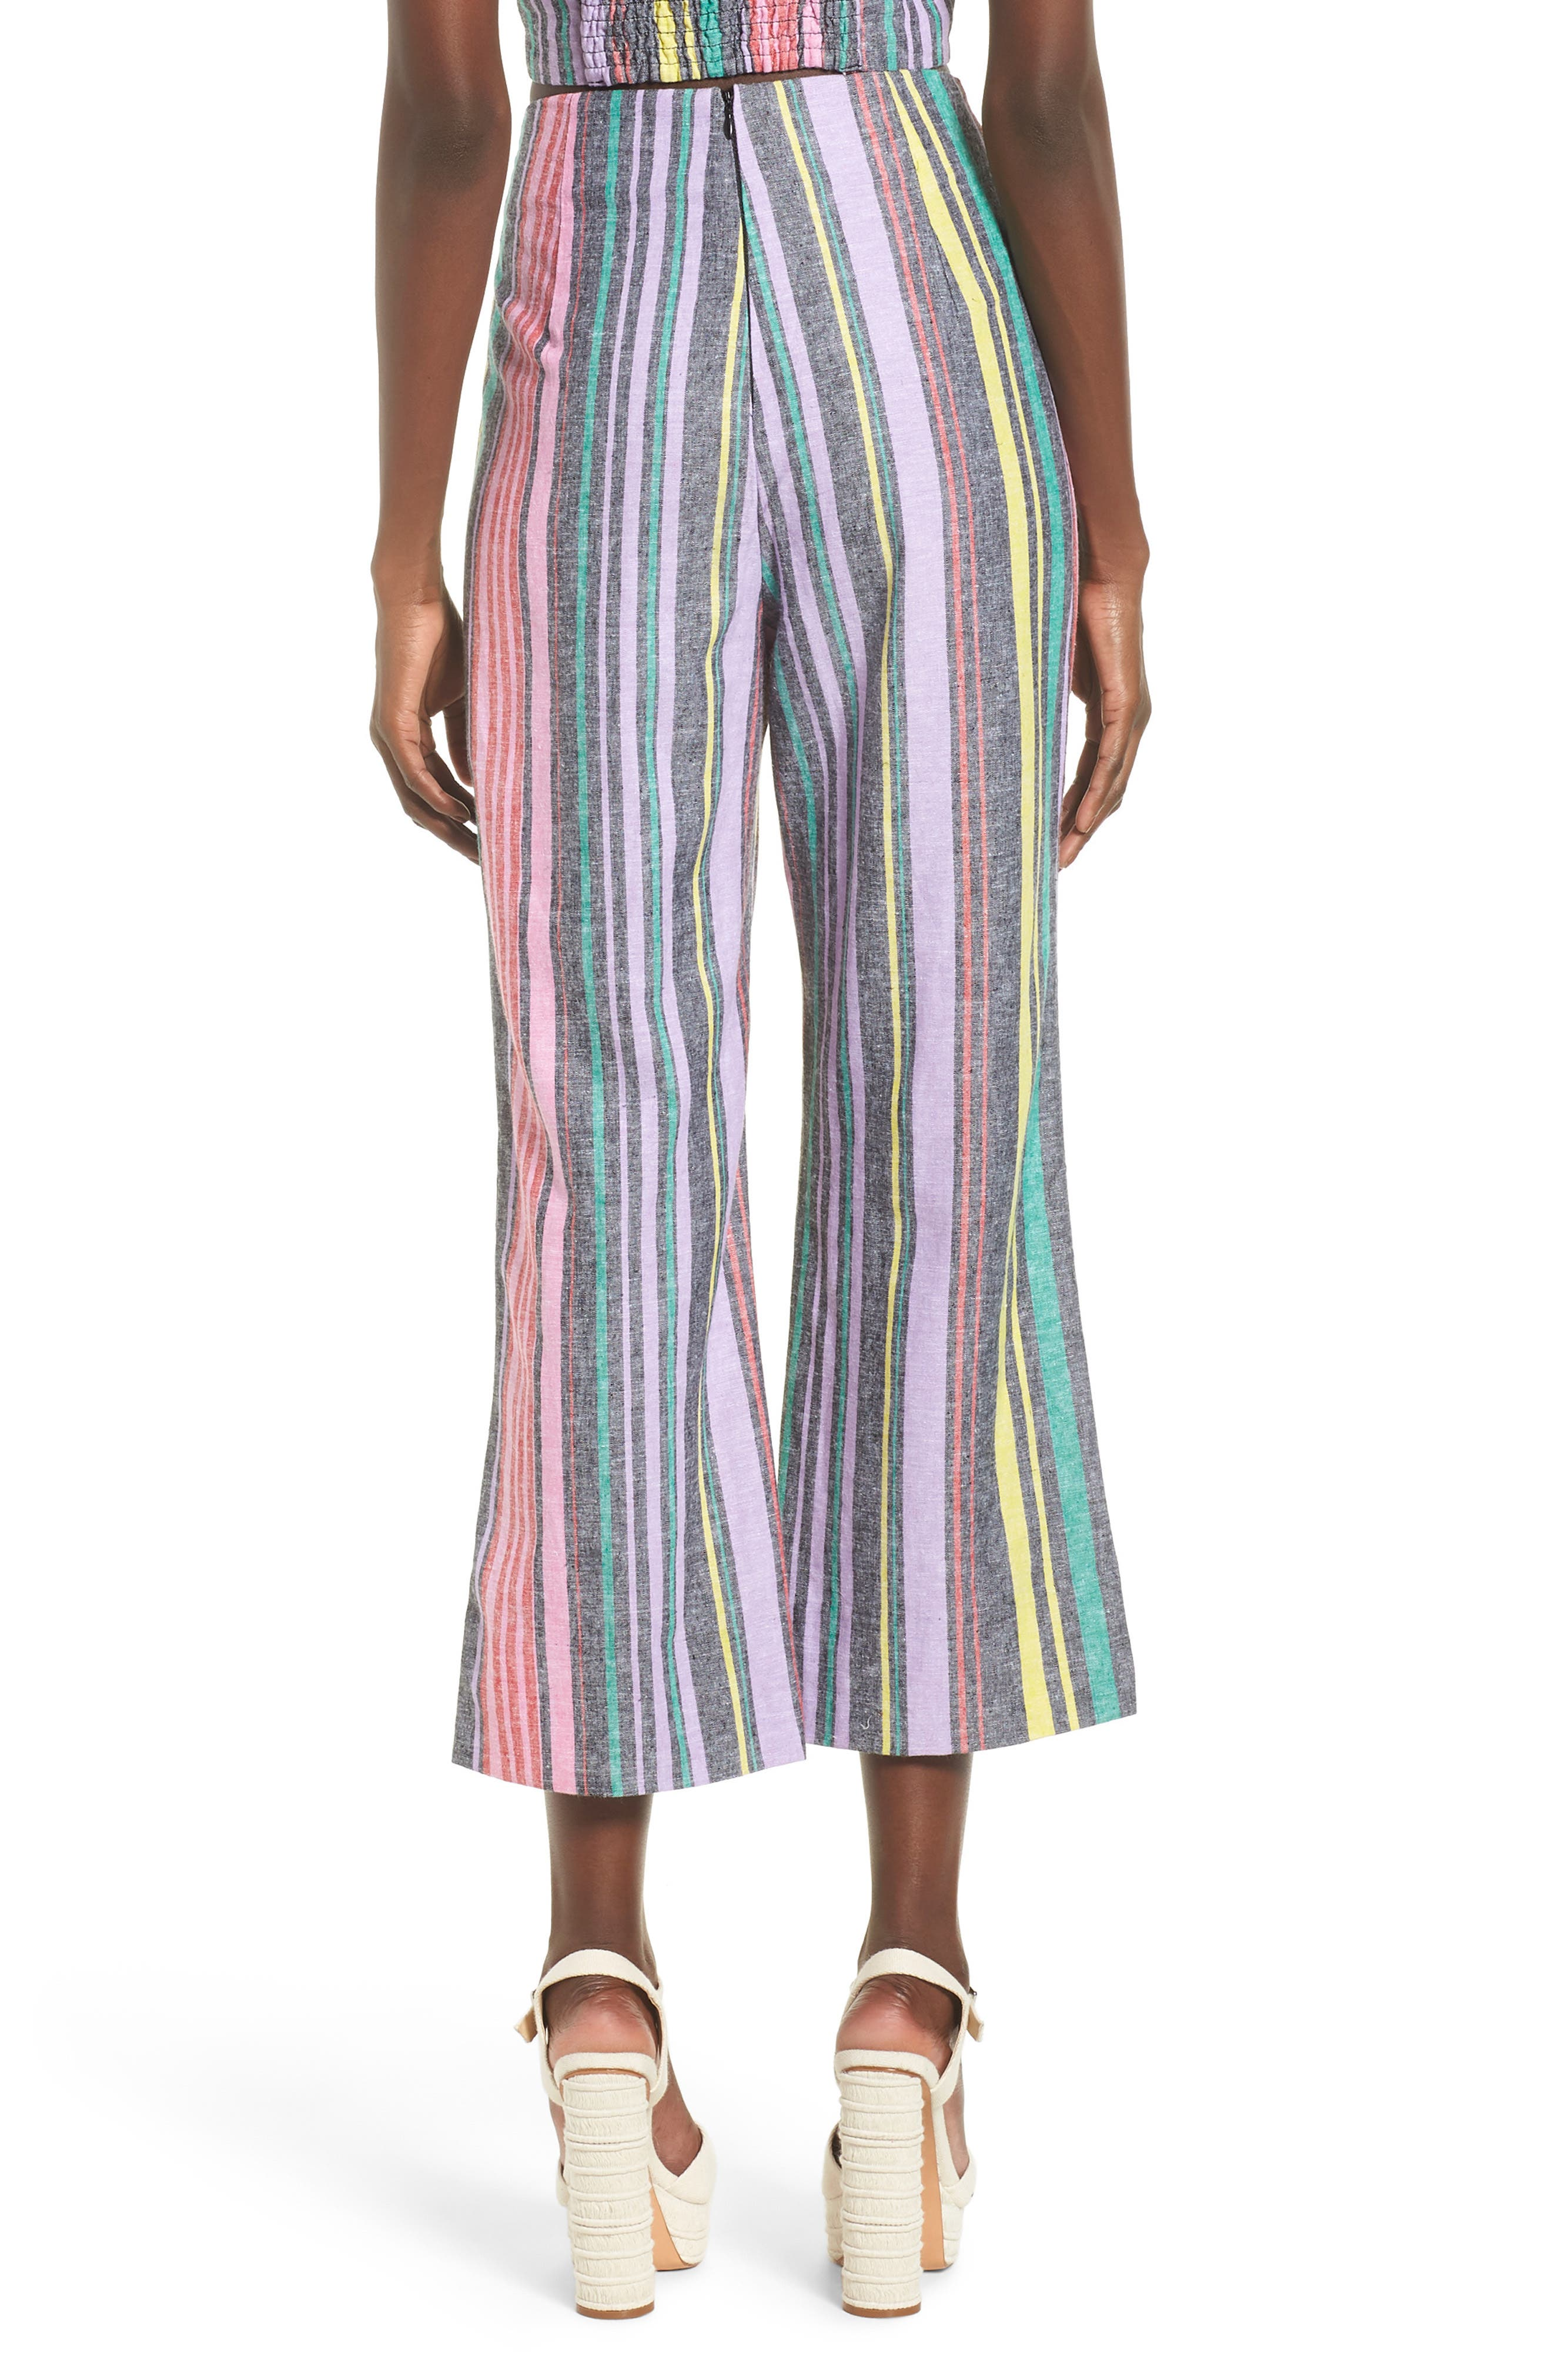 AFRM, Karina High Waist Crop Flare Pant, Alternate thumbnail 2, color, 650